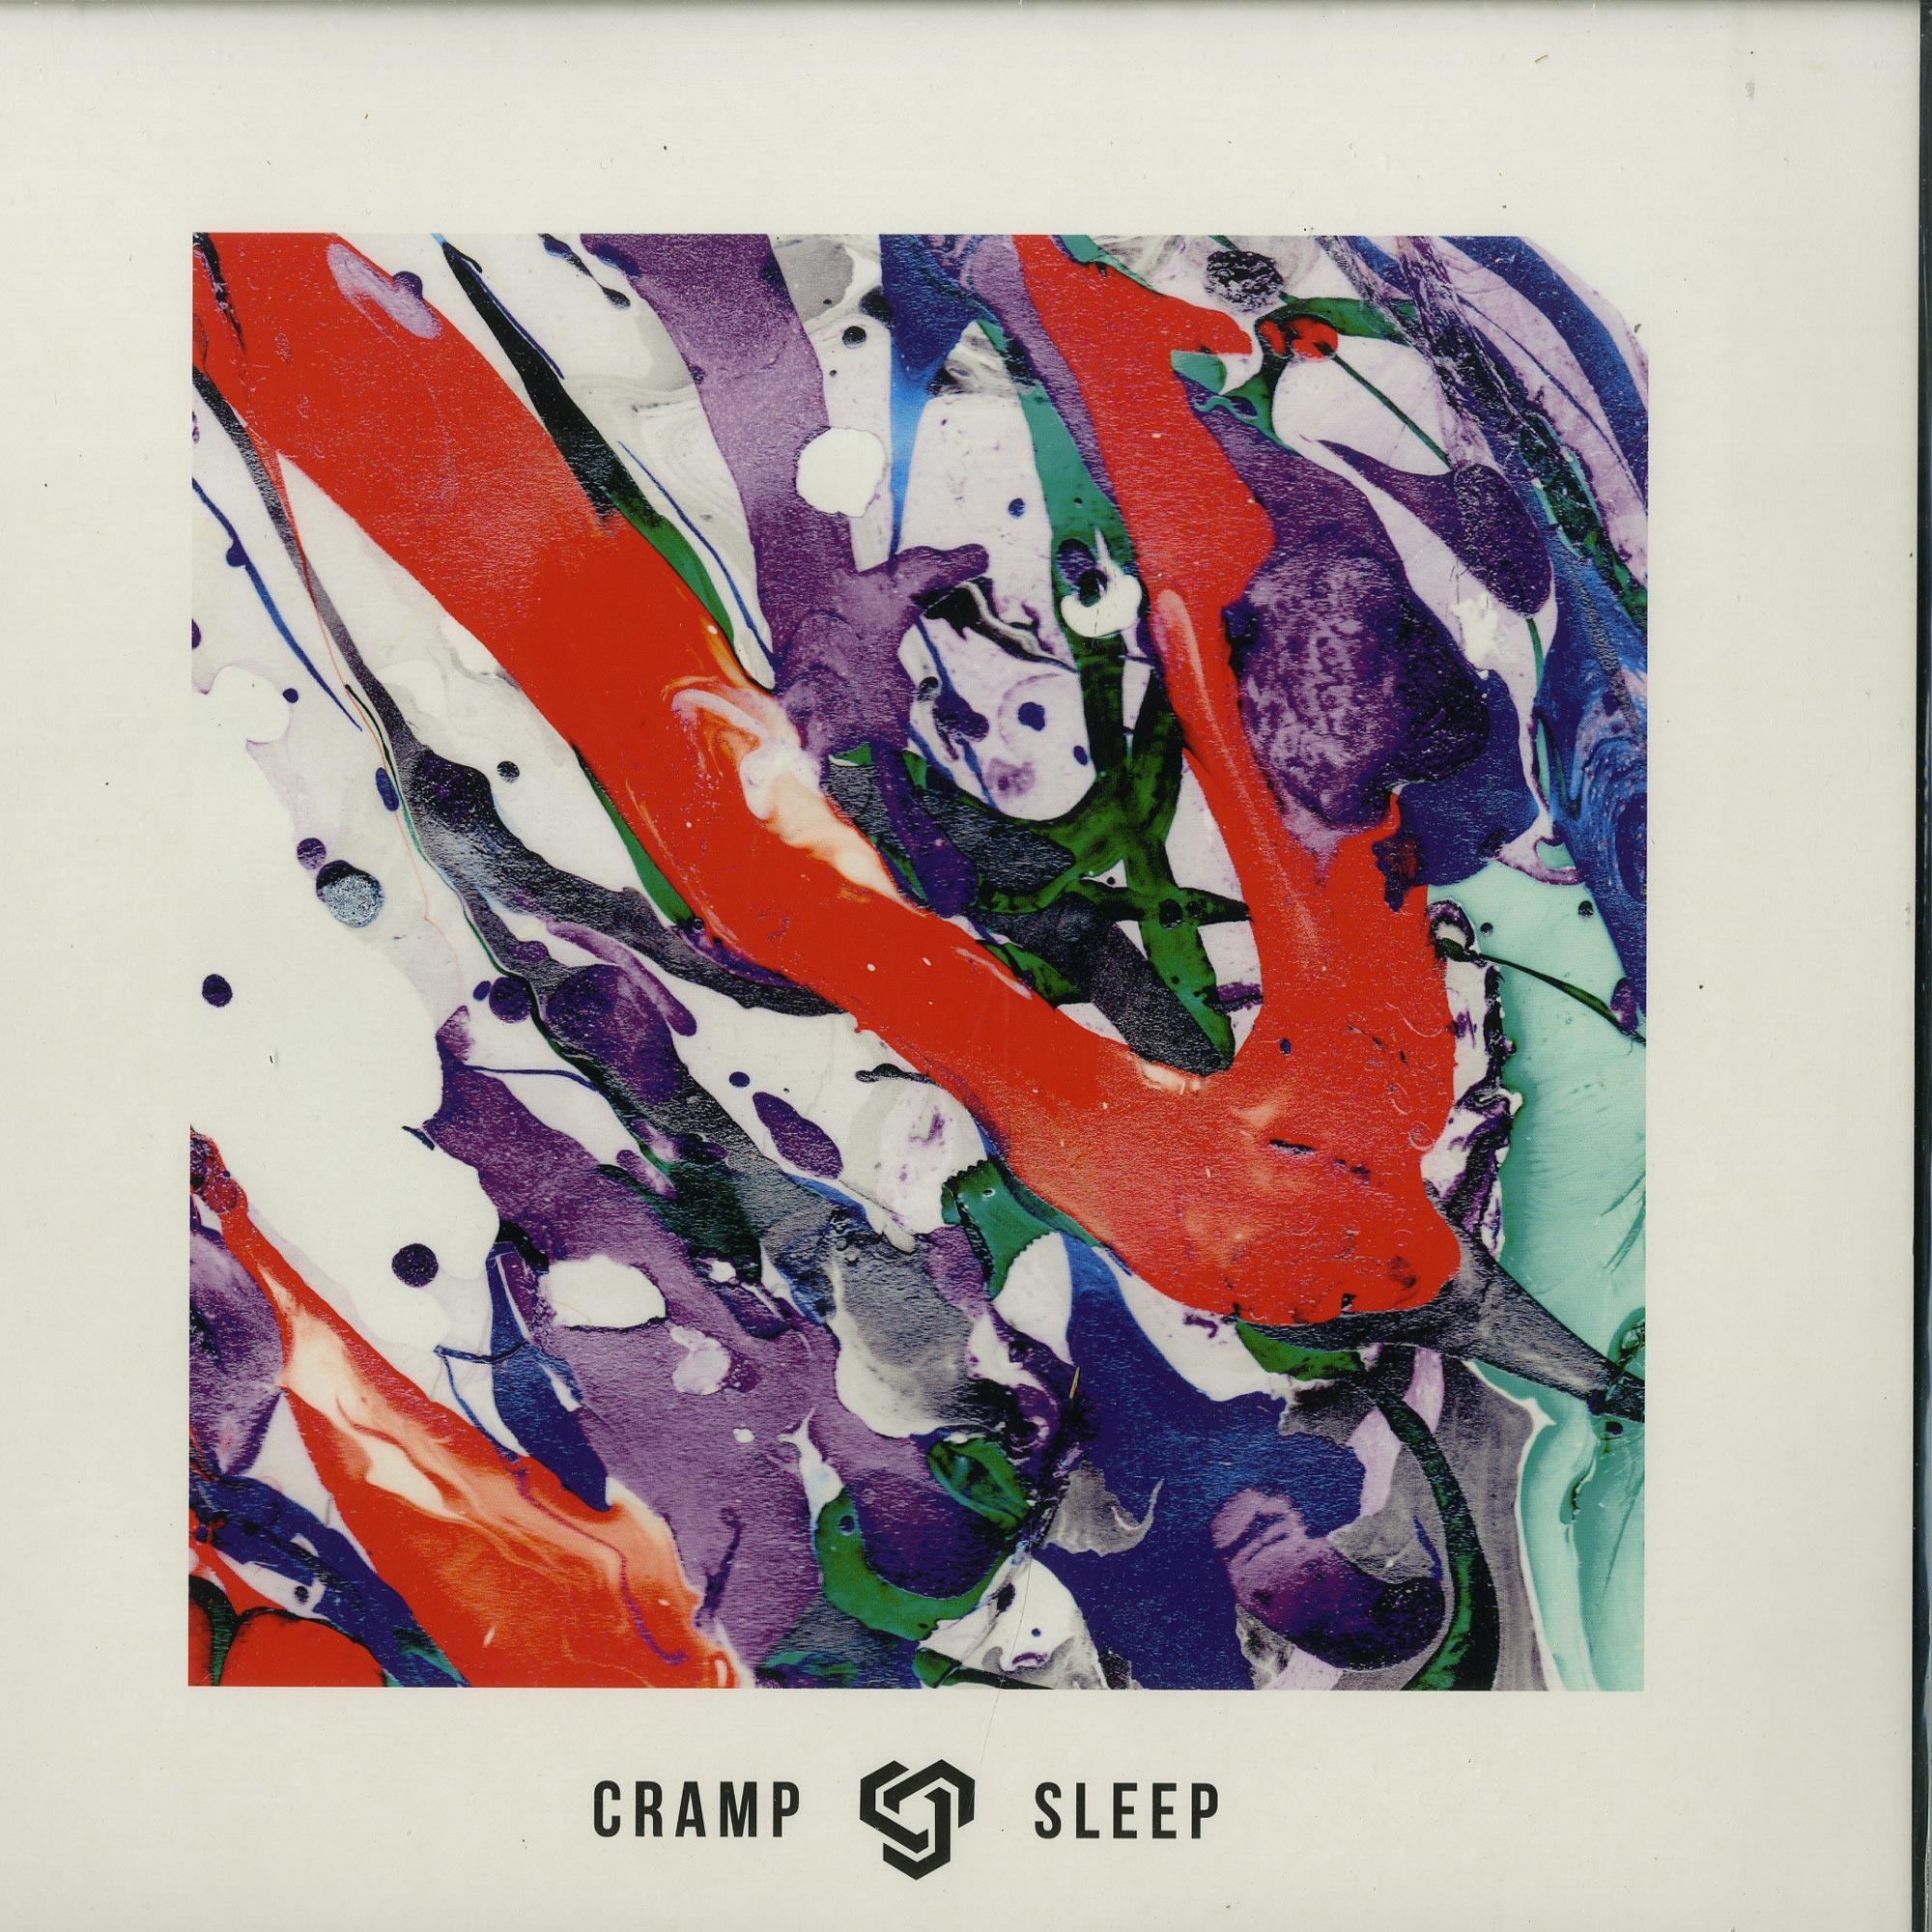 Cramp - SLEEP